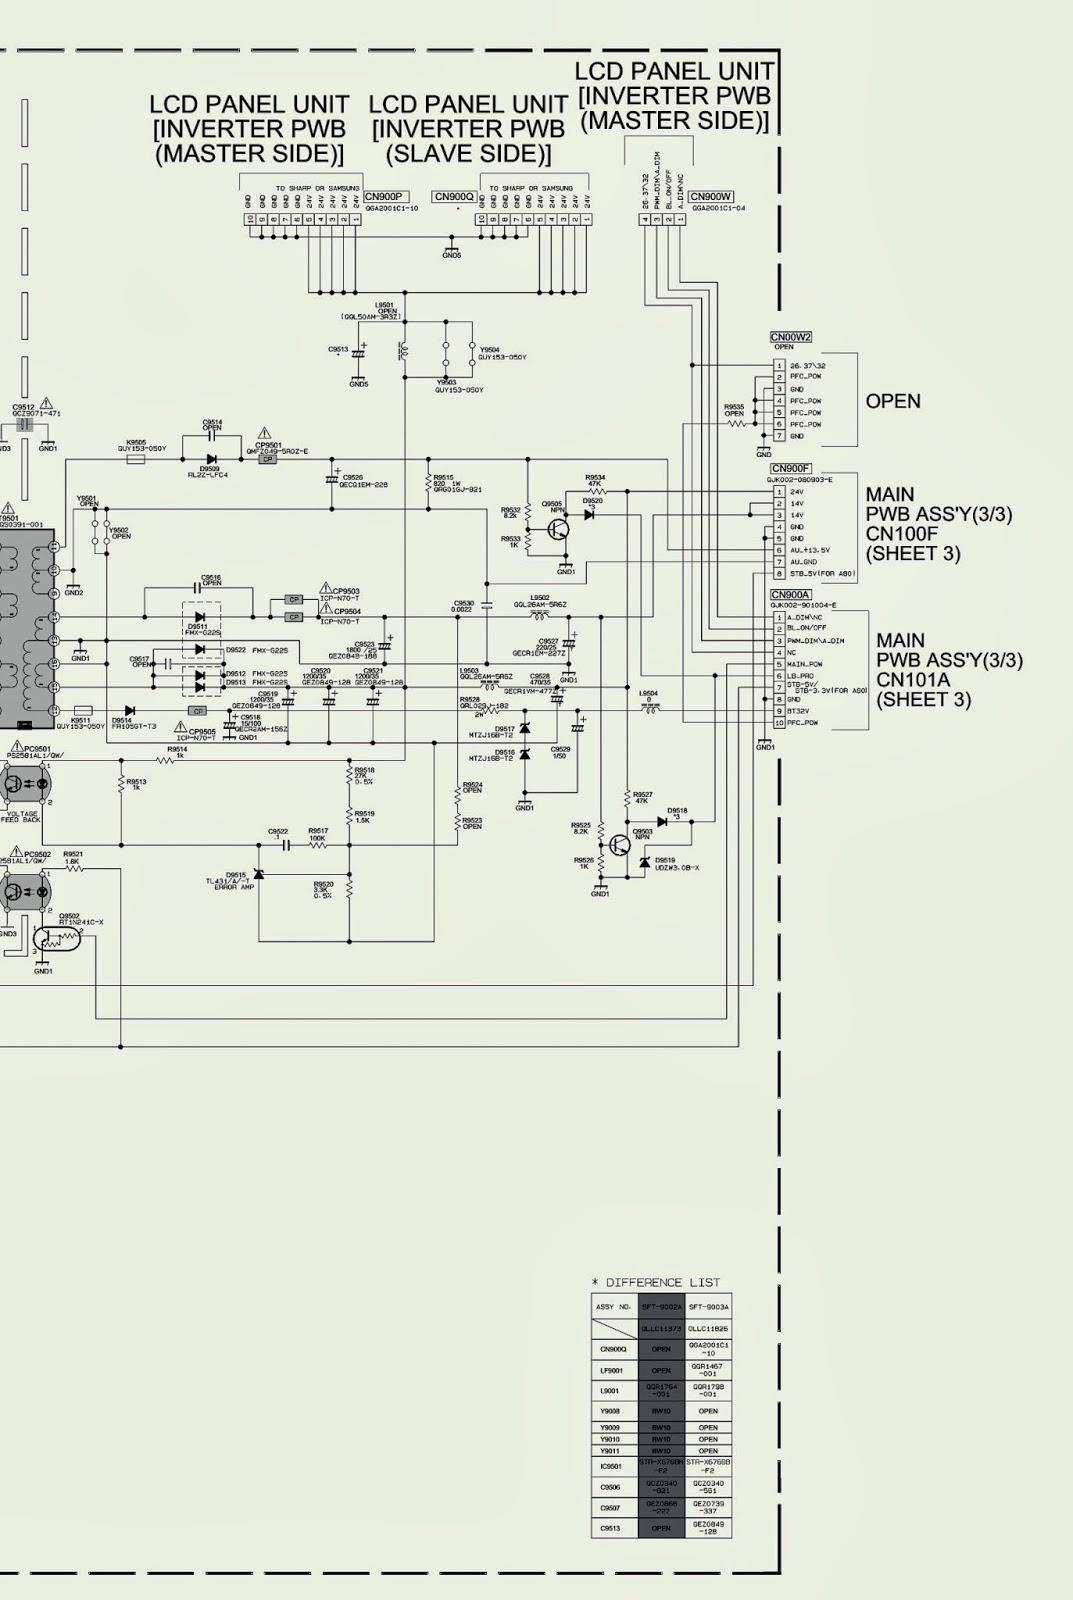 Jvc Lt 37s60bu Tv Schematic Diagrams Descargar Sendblaster Pro 2 Crack Diagram Summary Ebook 2887mb Download Scanning For